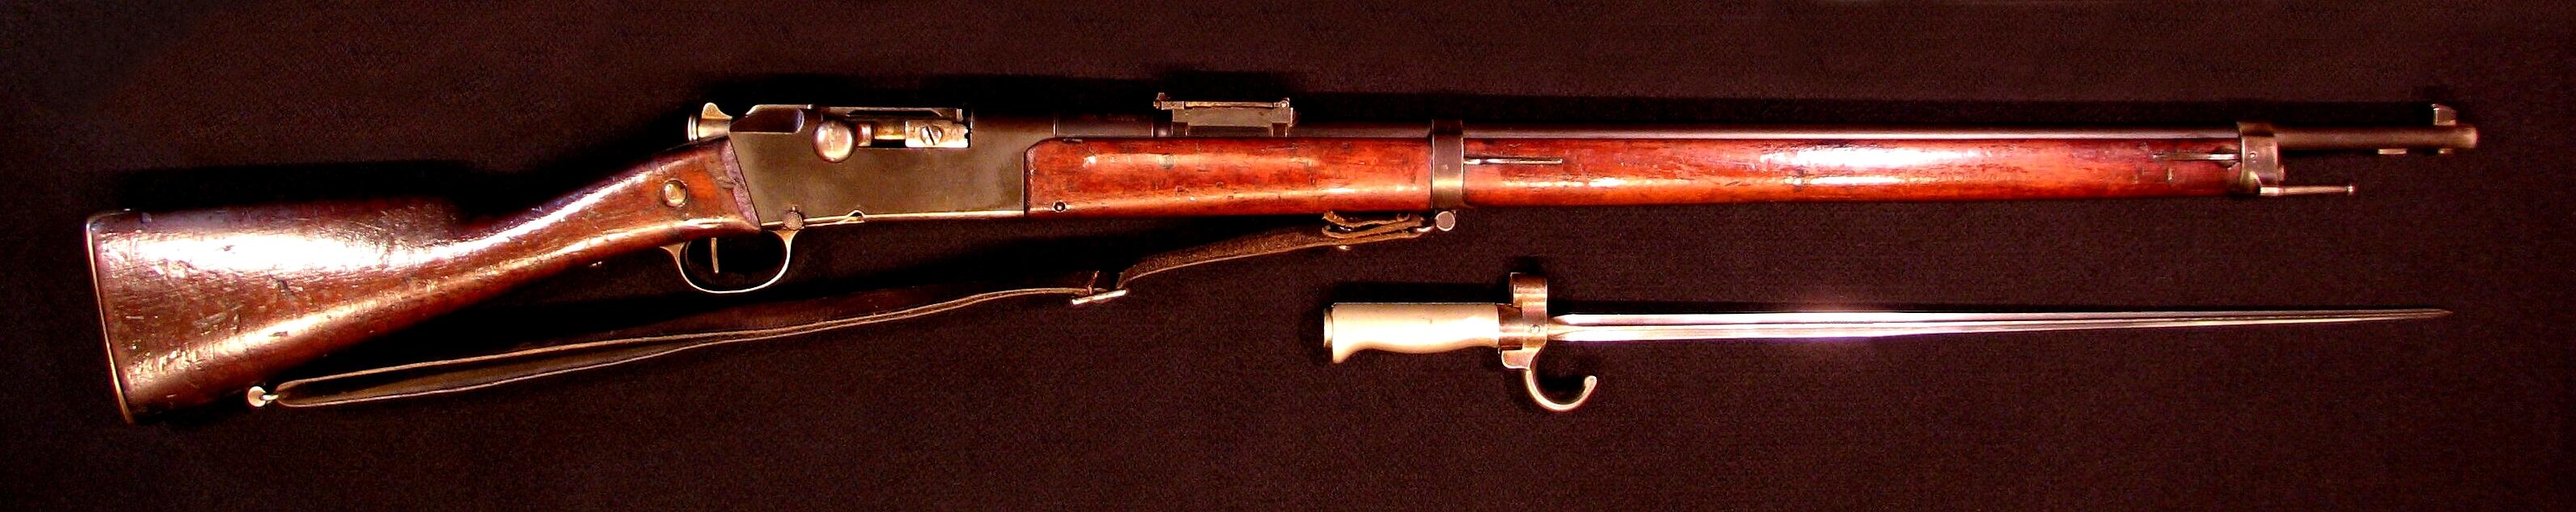 Click image for larger version.  Name:Mle 1886 Lebel Rifle 01B (1).jpg Views:6 Size:1.65 MB ID:3687191